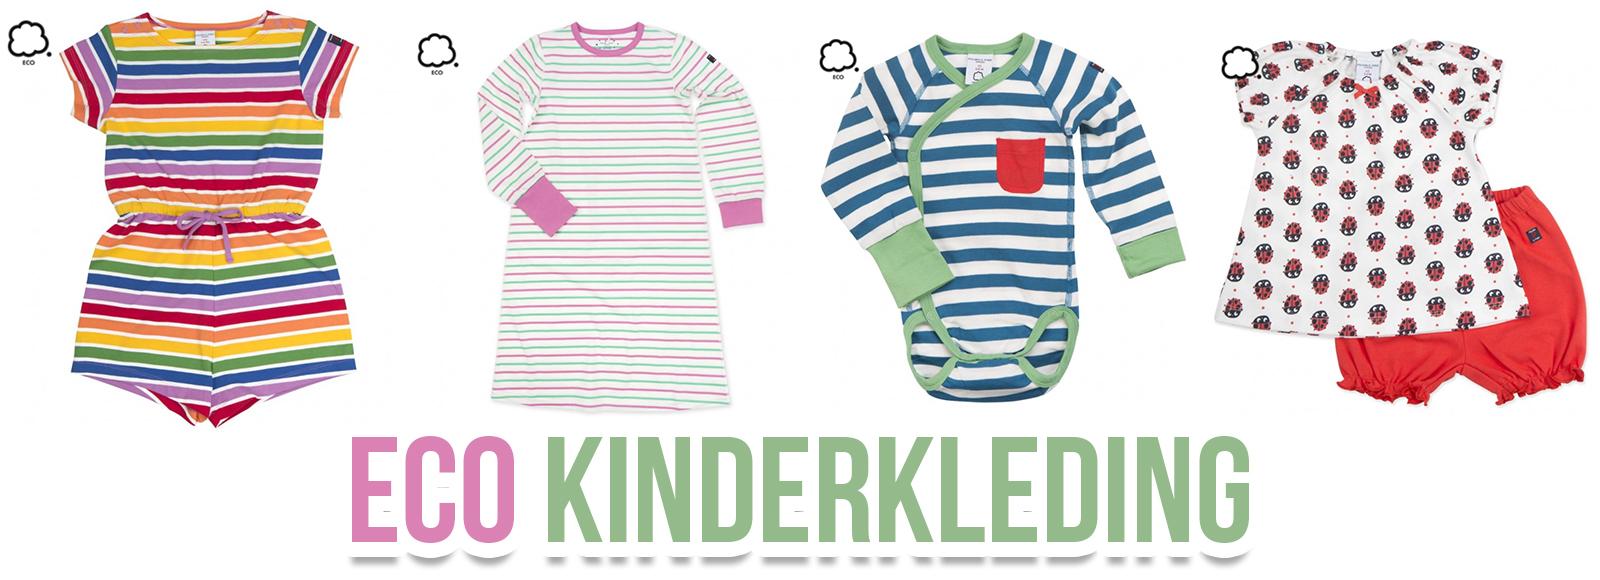 Eco Kinderkleding Polarn O Pyret